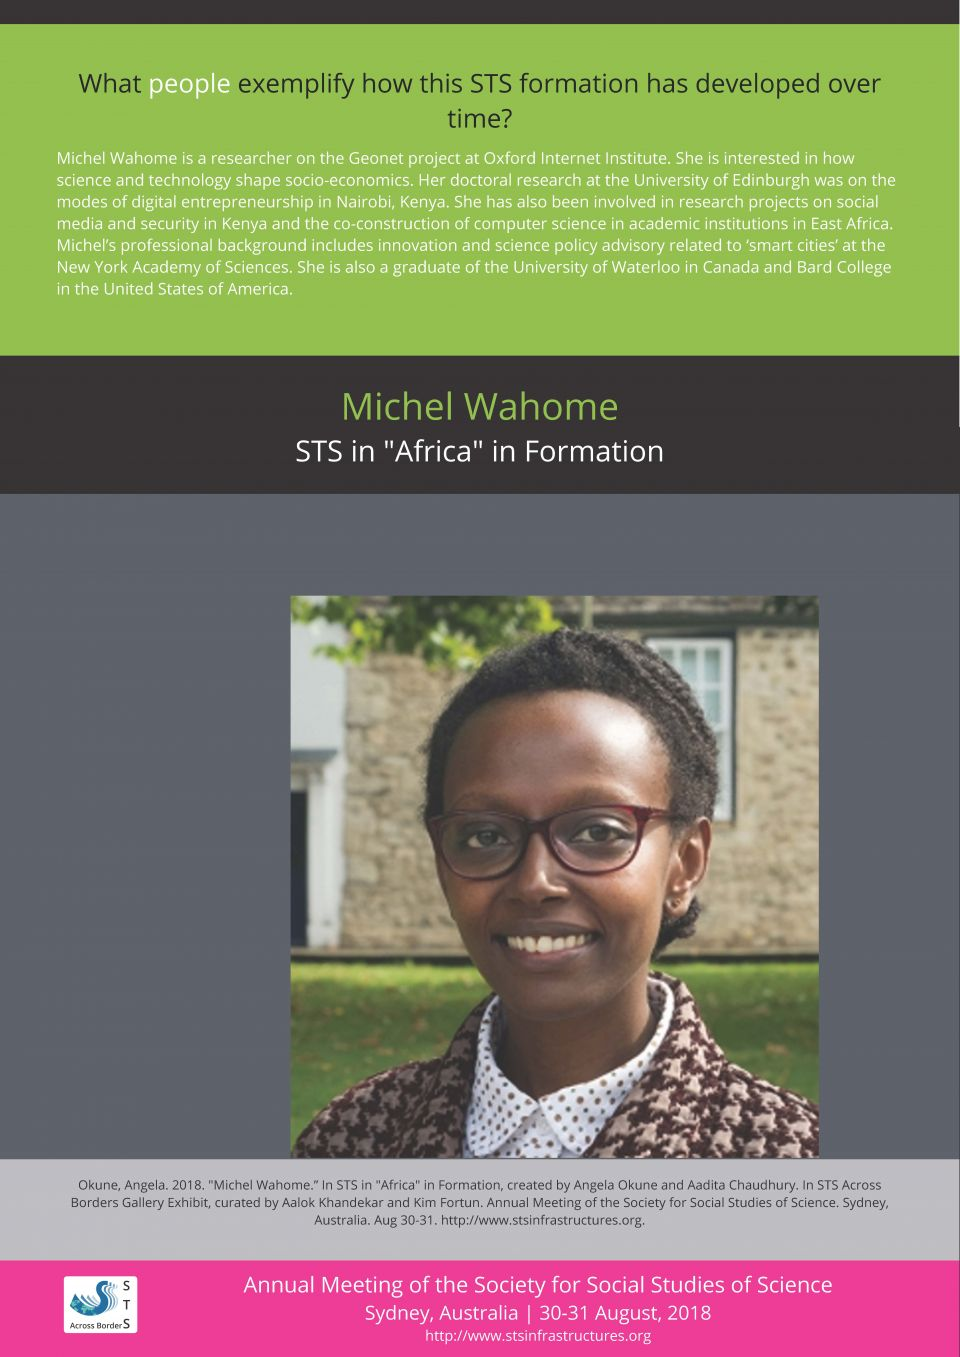 Michel Wahome